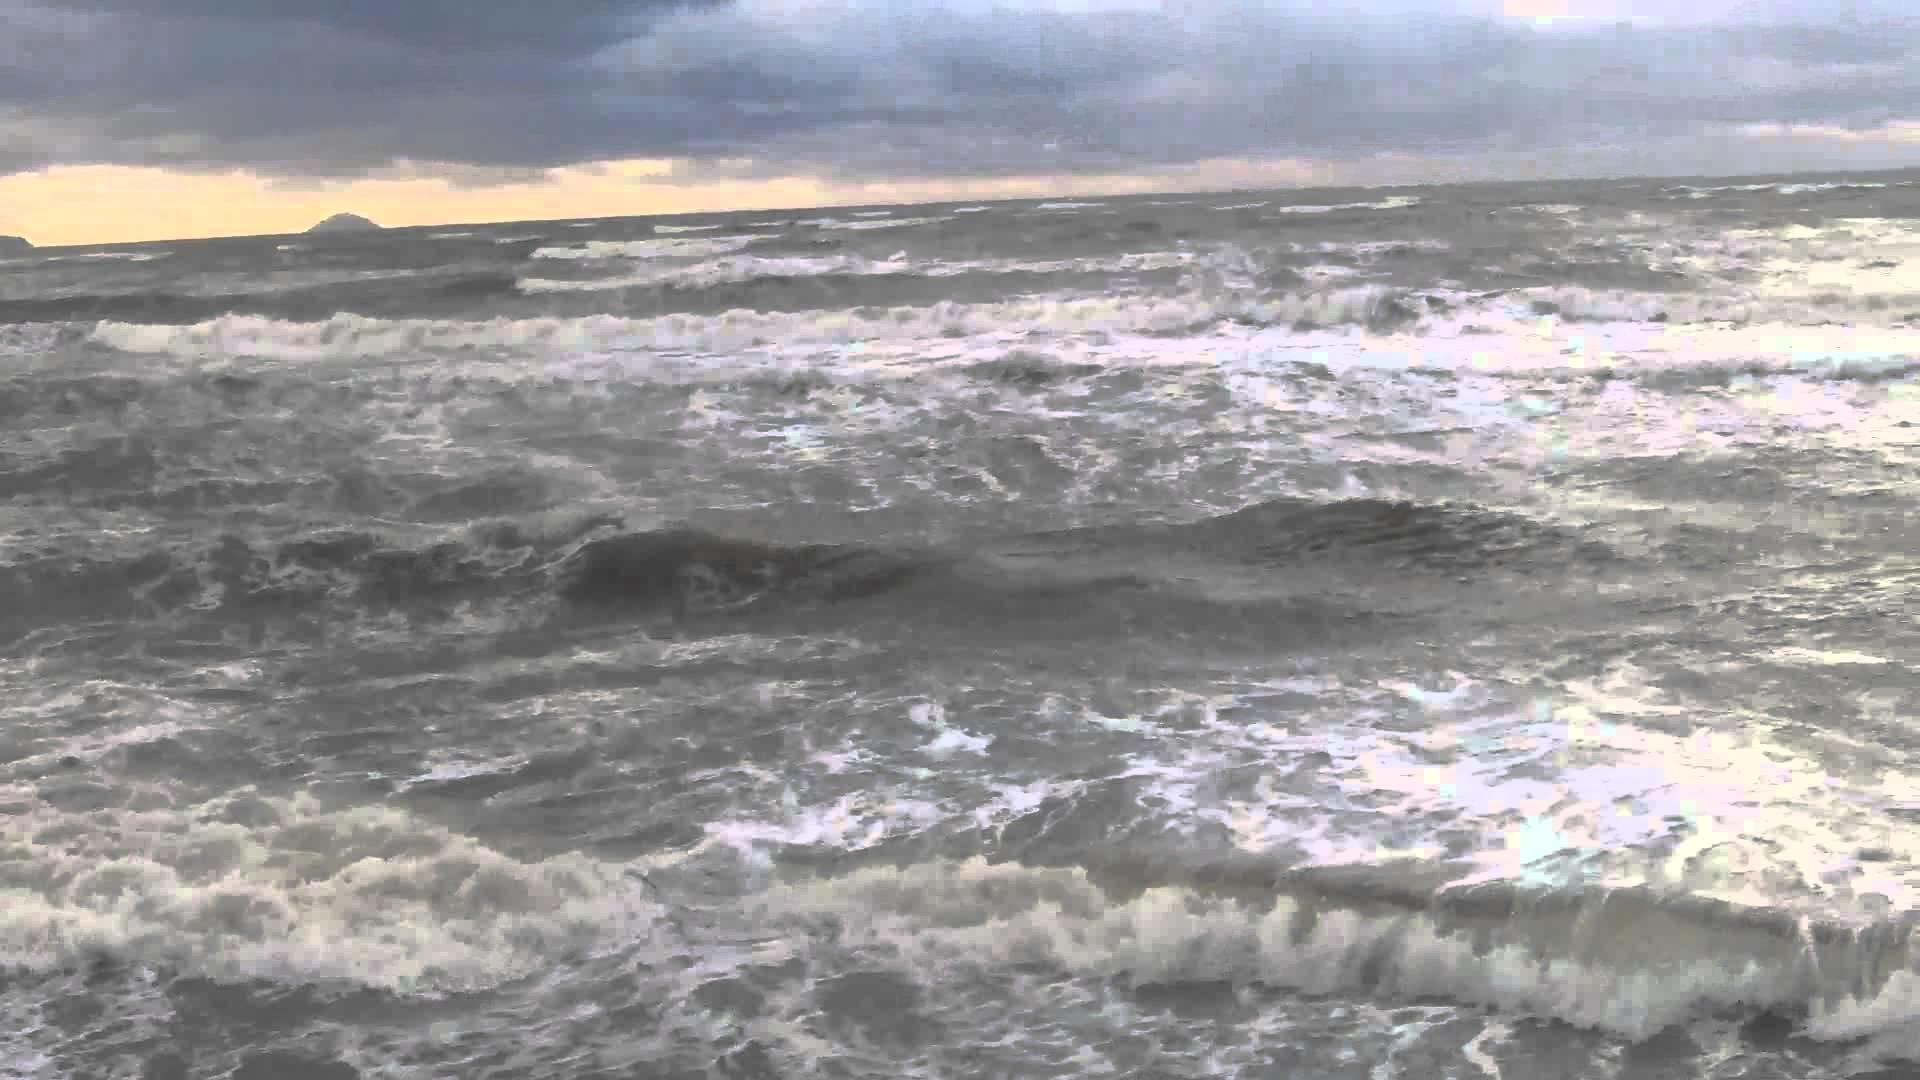 Stormy sea weather and big waves at Prestwick beach Scotland UK Europe